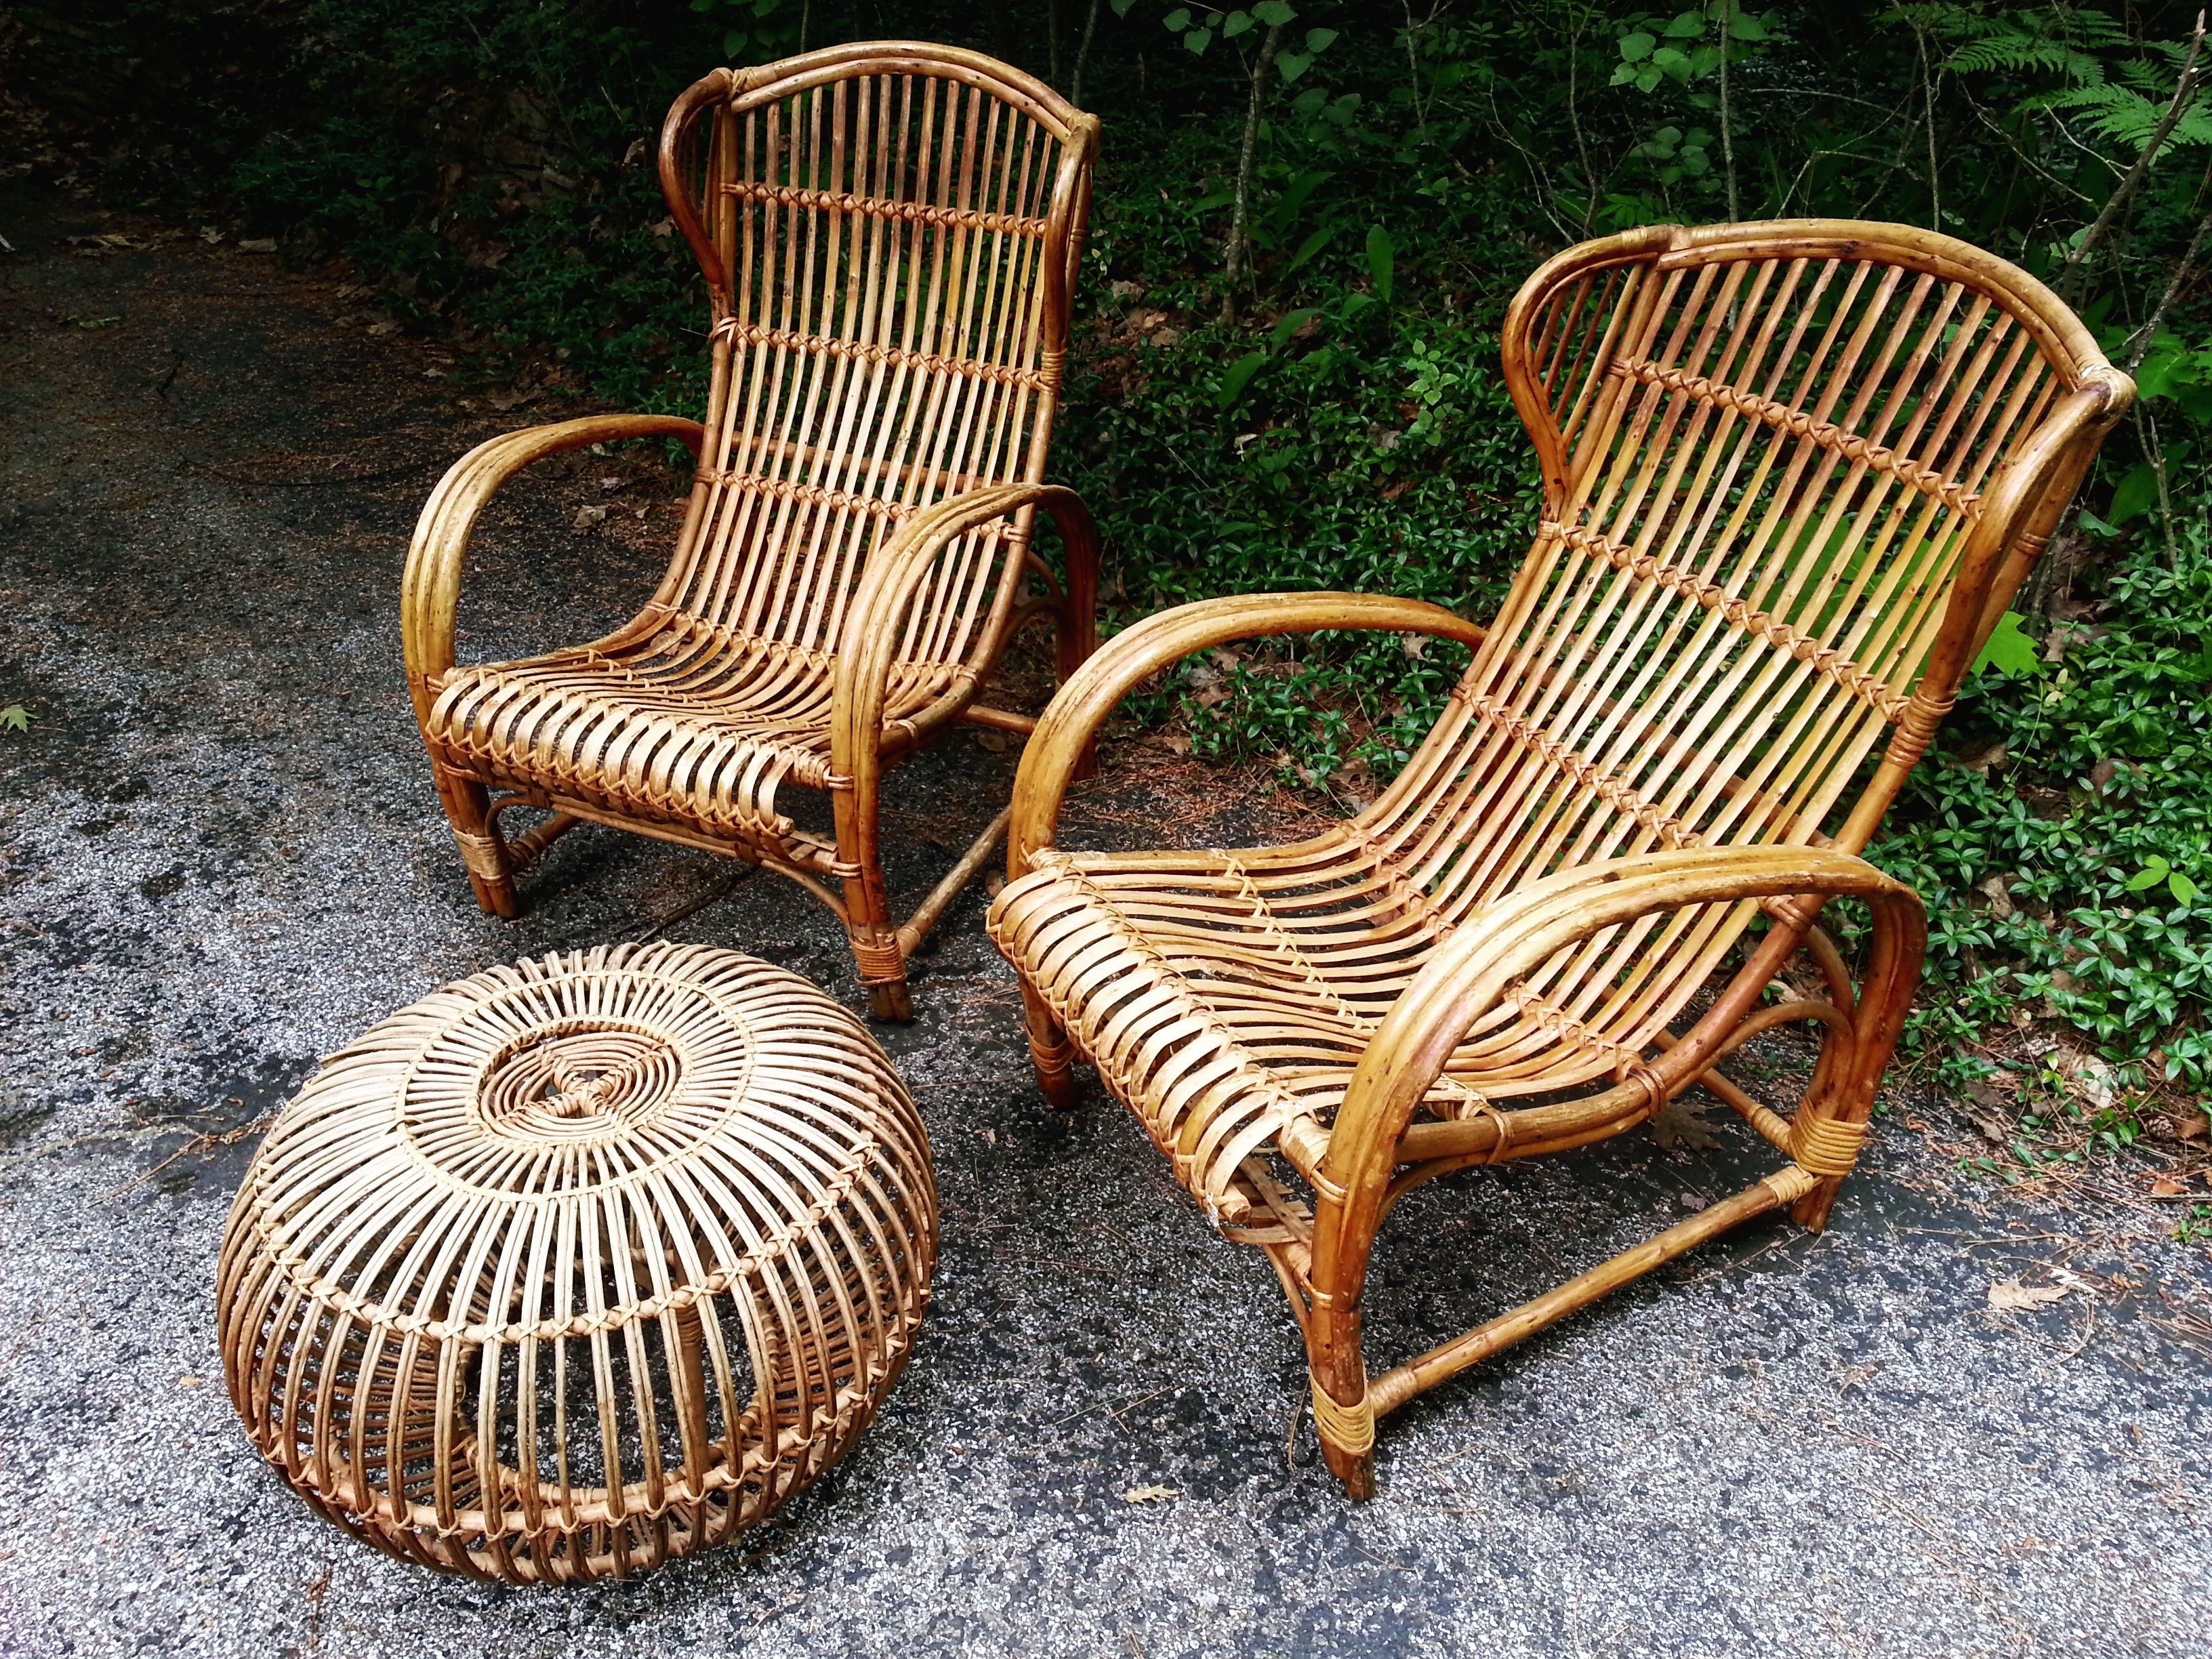 Park Art My WordPress Blog_Vintage Rattan Chair With Ottoman